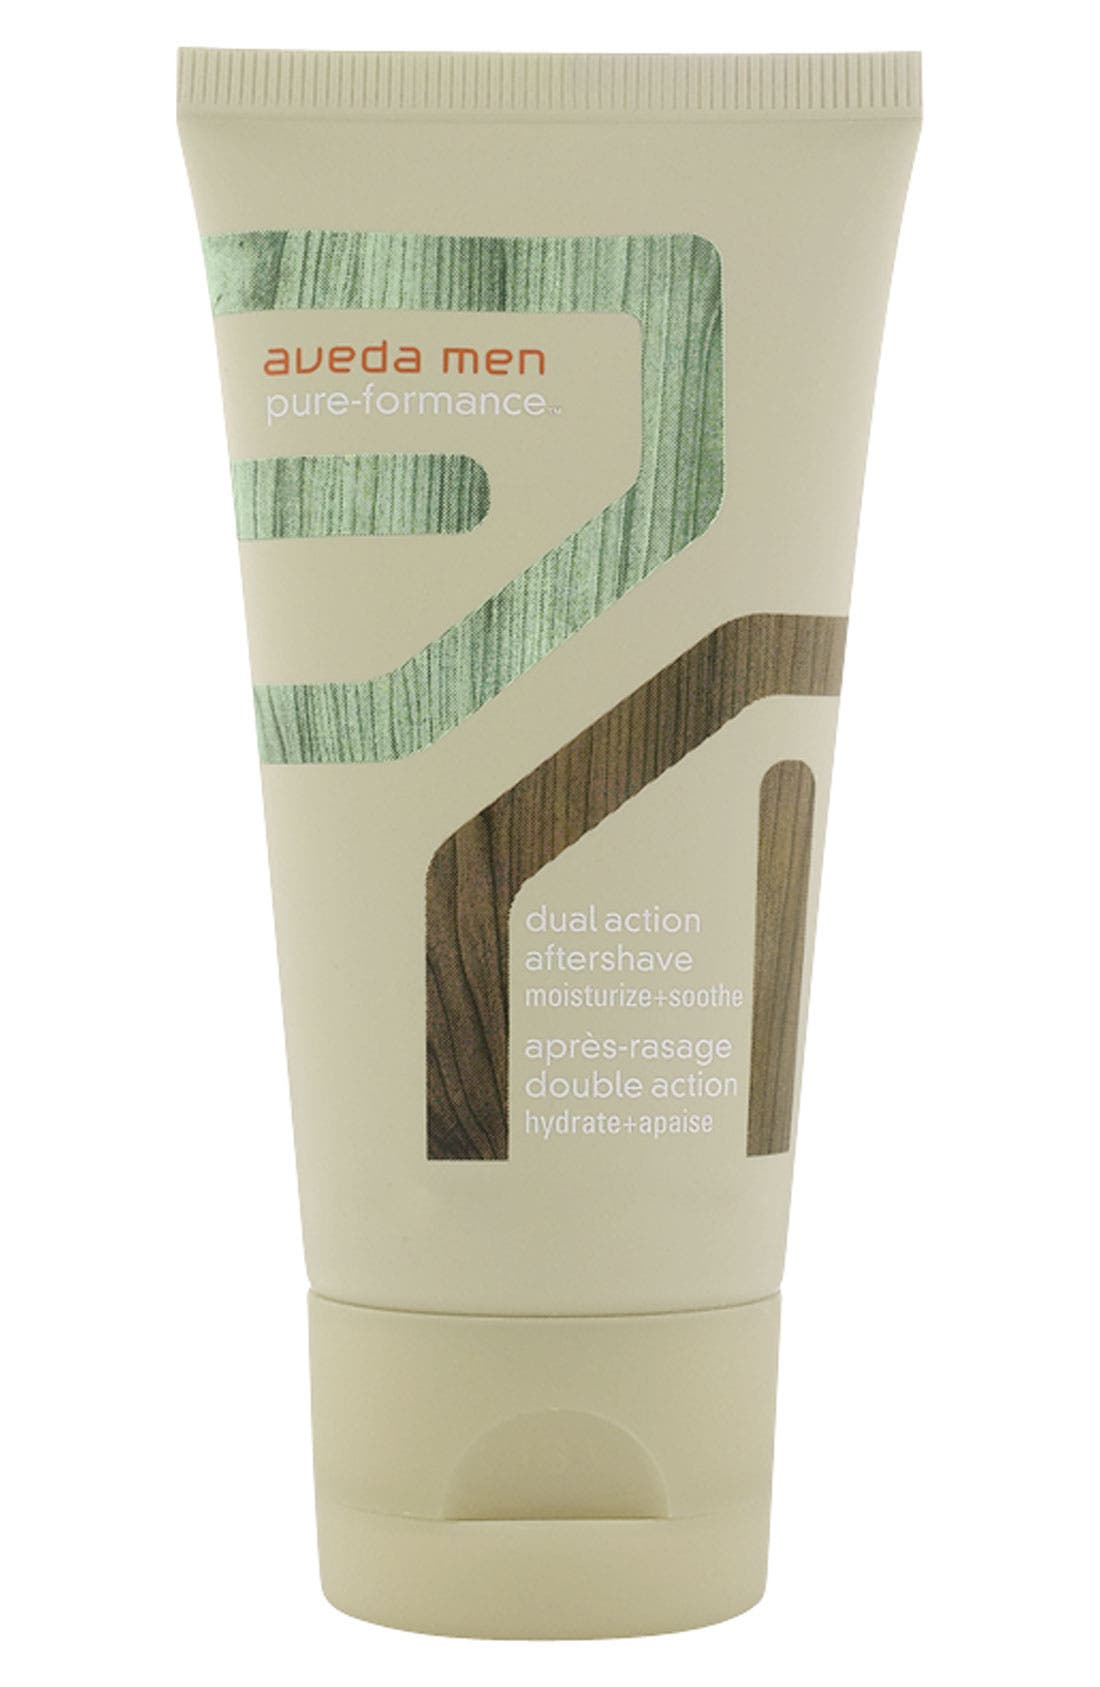 AVEDA,                             Men pure-formance<sup>™</sup> Dual Action Aftershave,                             Main thumbnail 1, color,                             NO COLOR